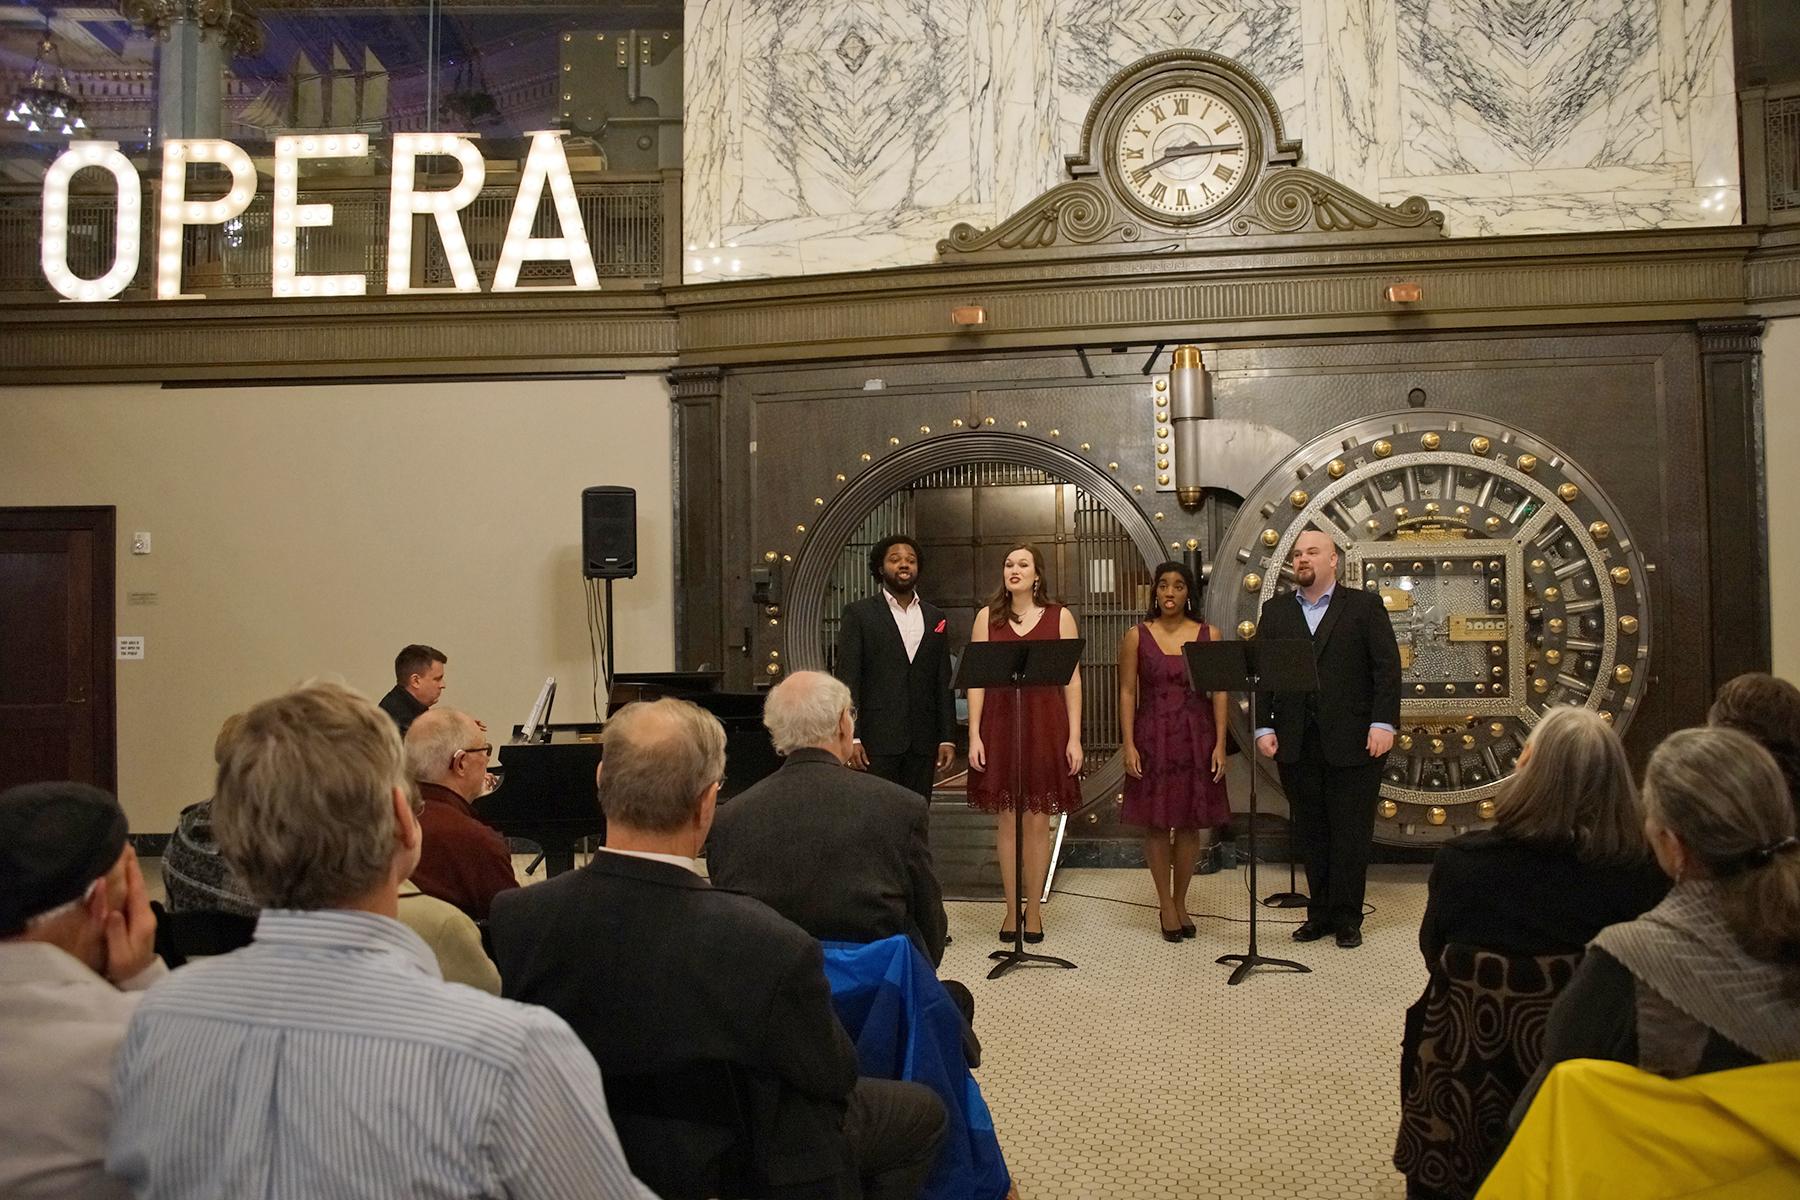 essays on opera Return to bruce schoonmaker's home page schoonmaker's home page.